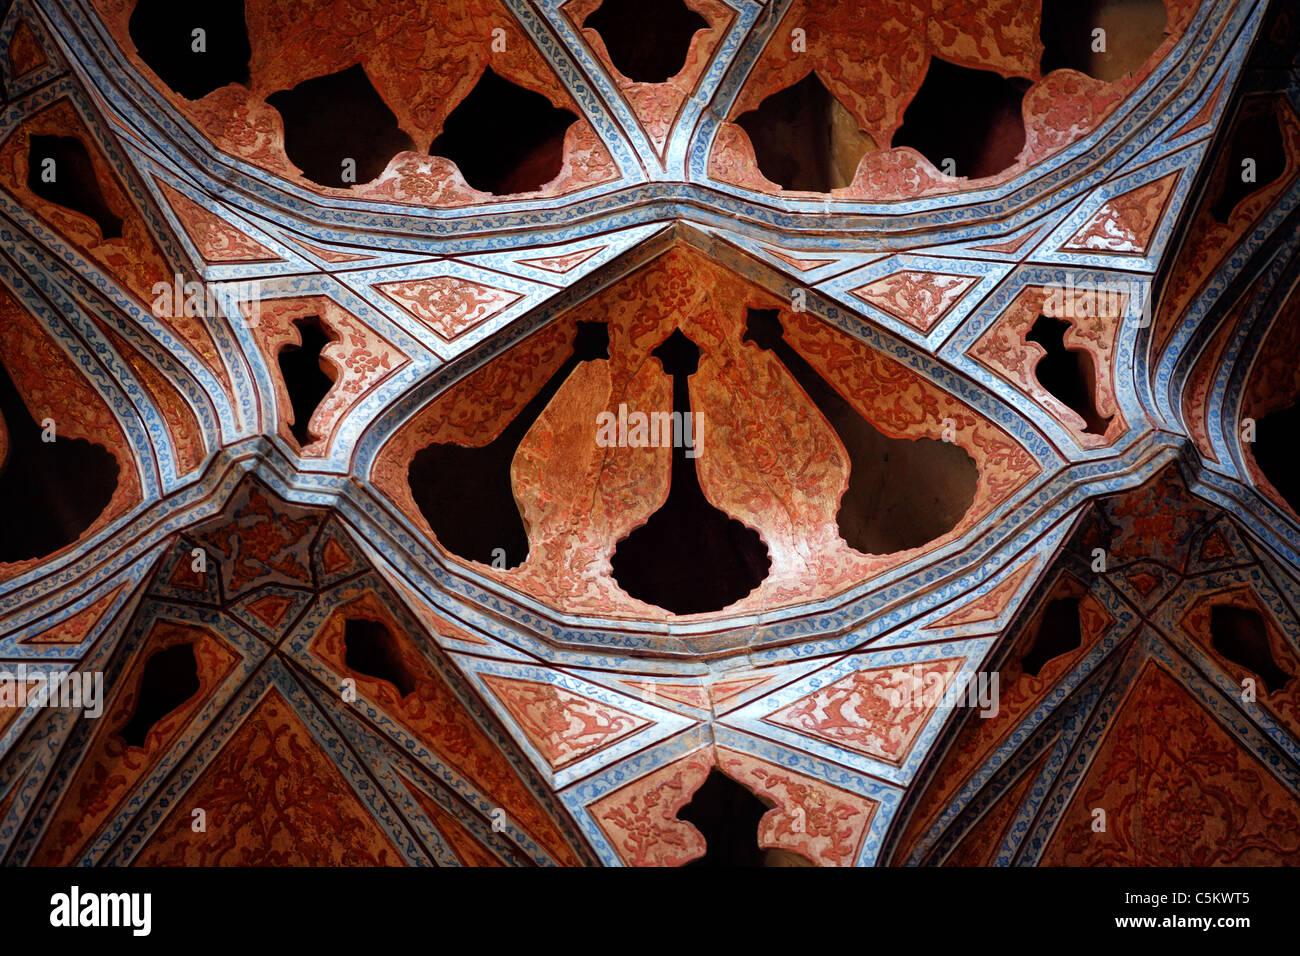 Ali Qapu palace (early 17th century), Imam square, Isfahan, Iran Stock Photo